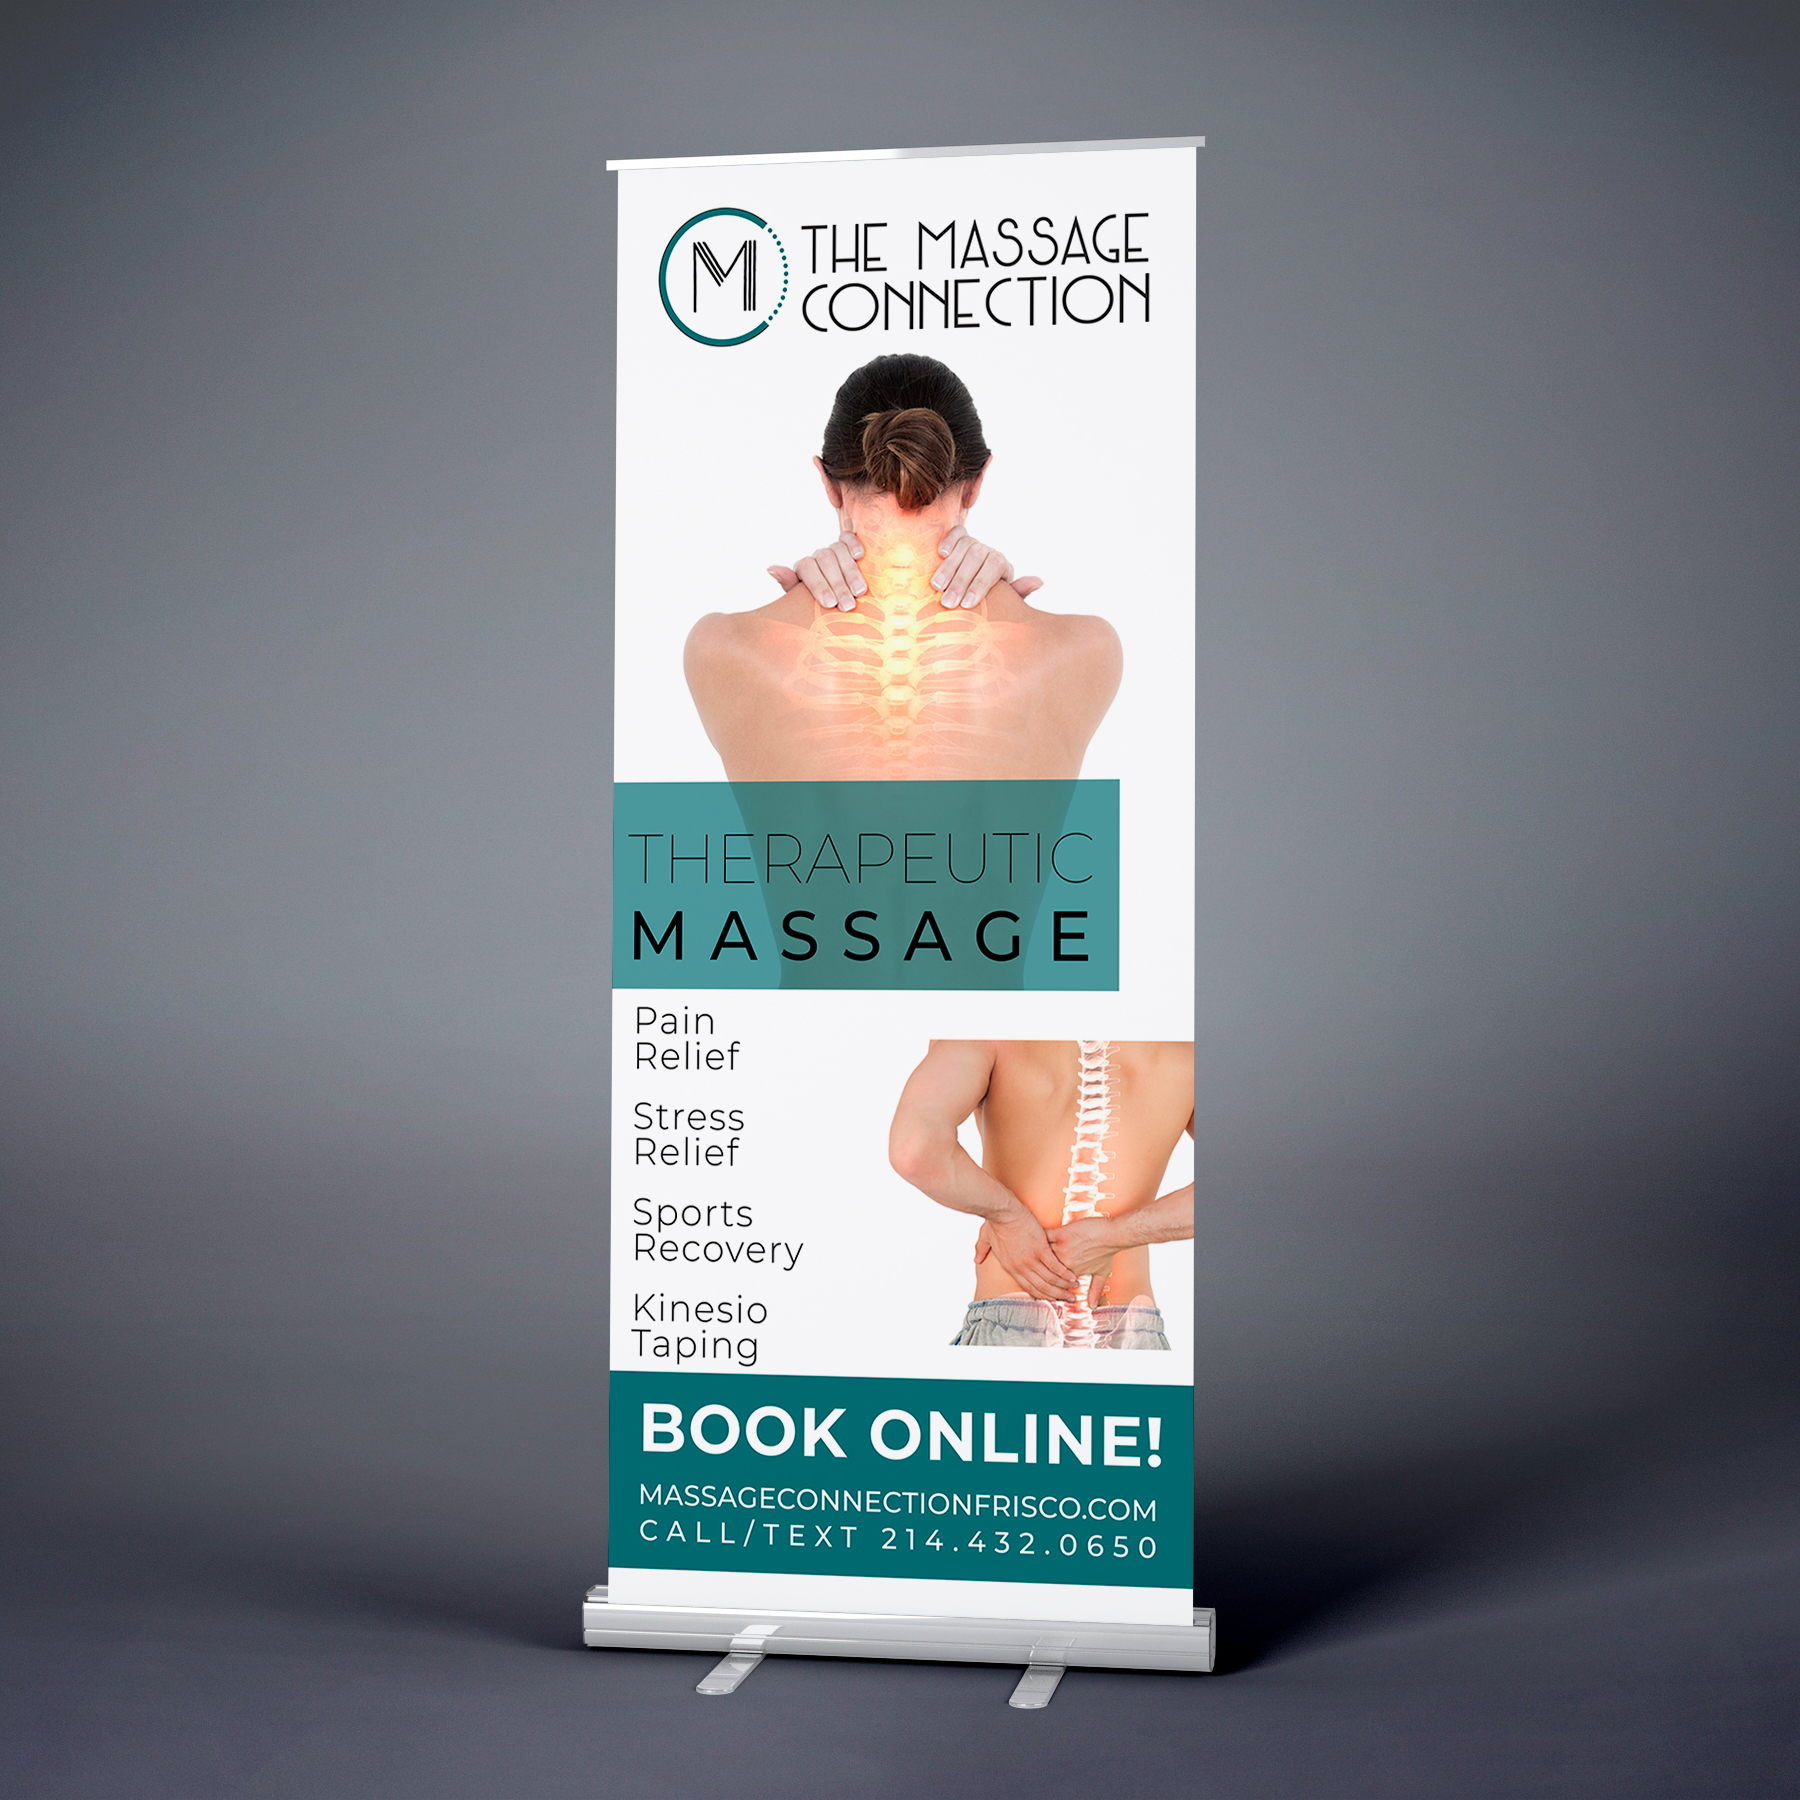 massage banner for chiropractor office